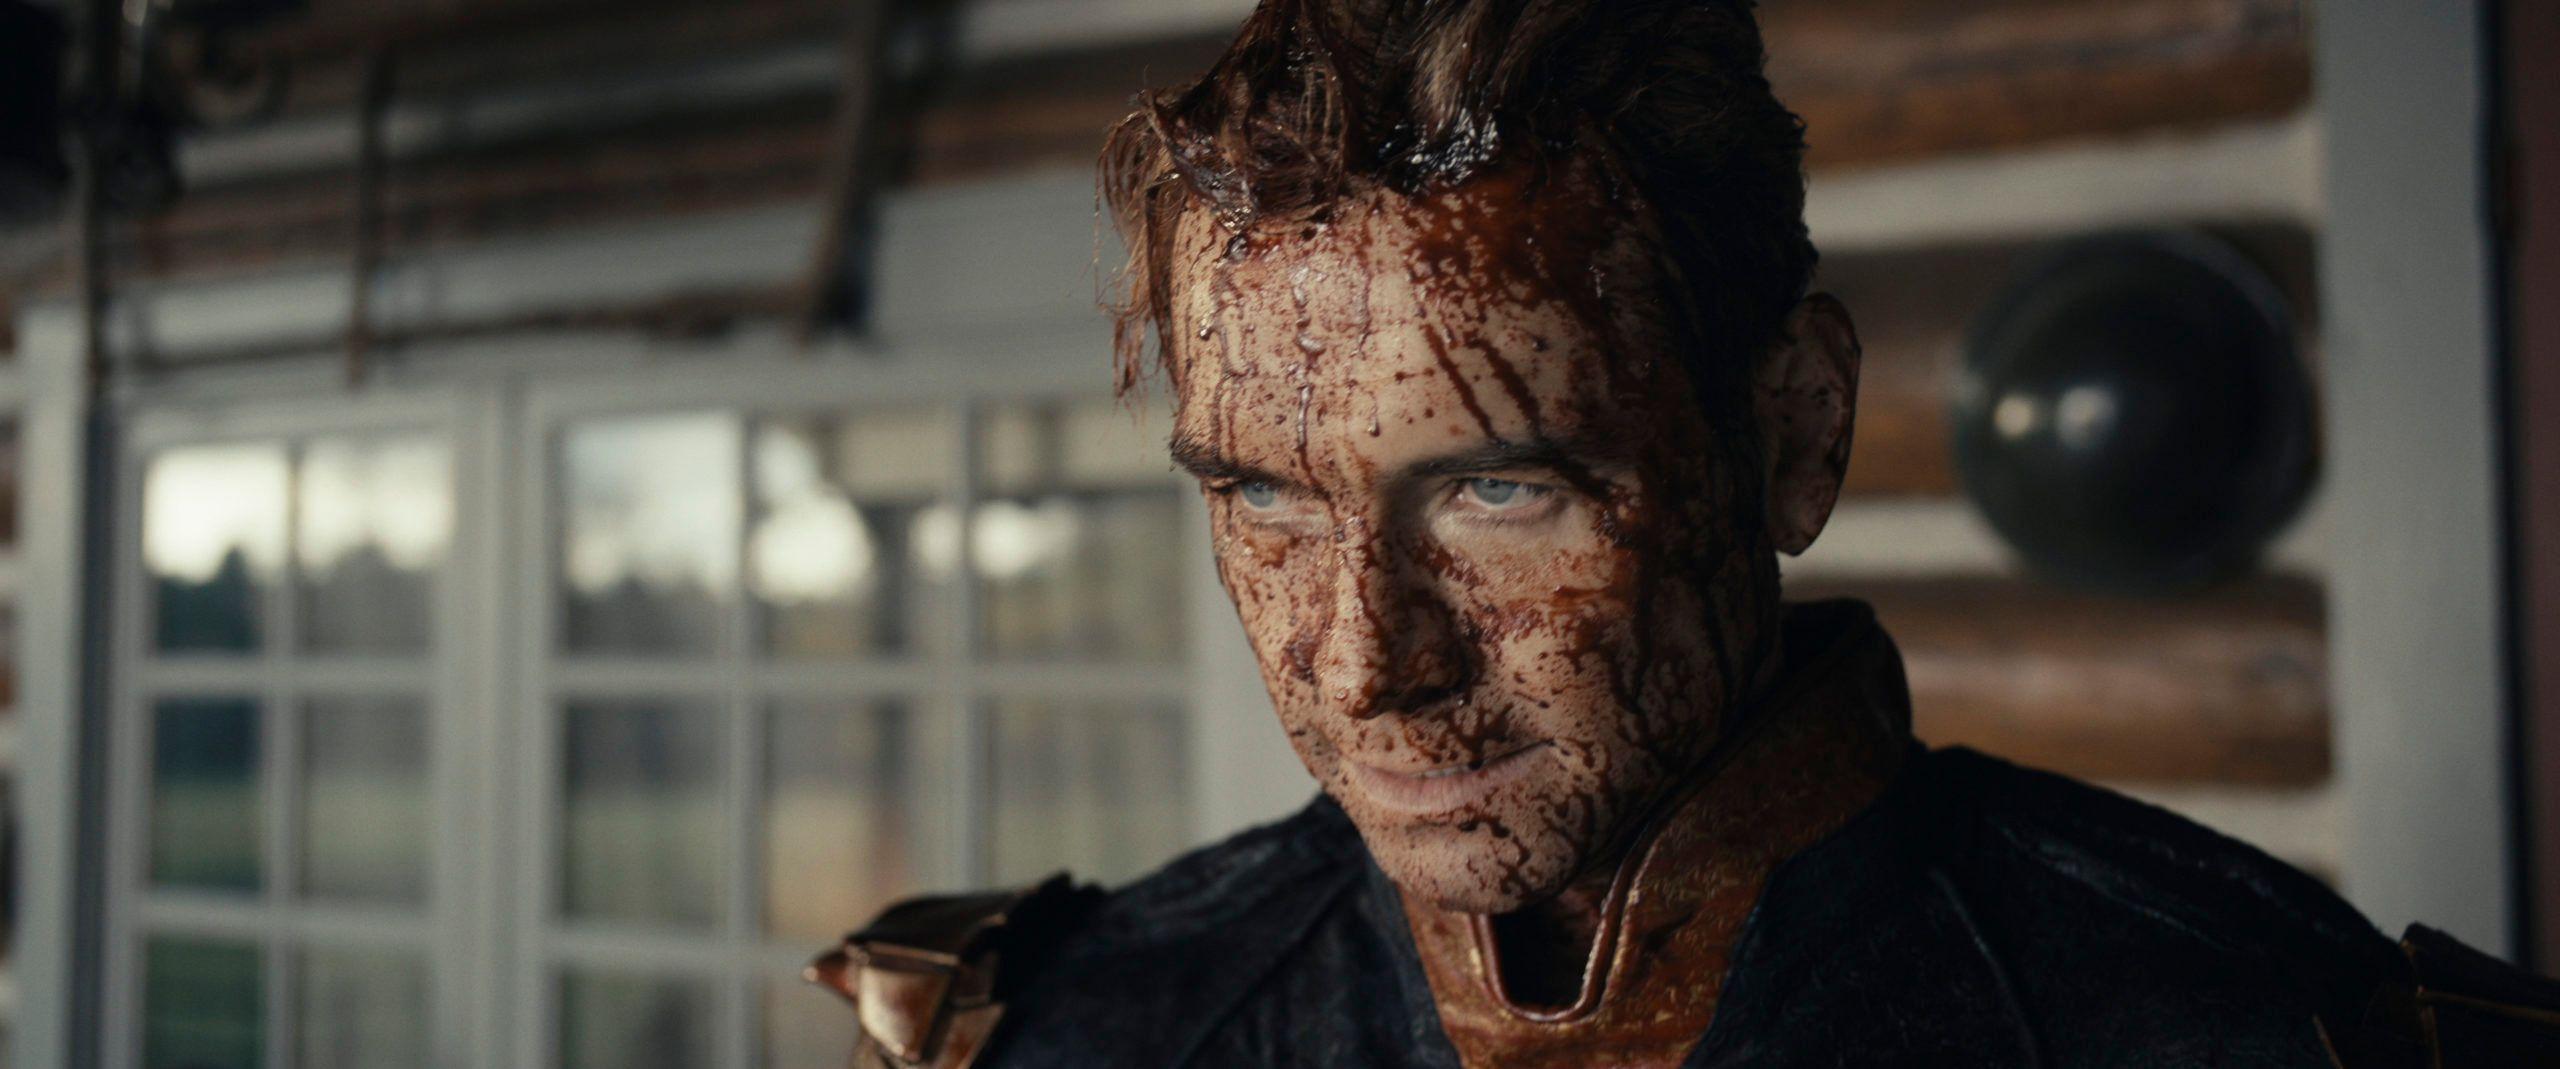 The Boys: Antony Starr on Homelander's Season 3 Fate | Collider